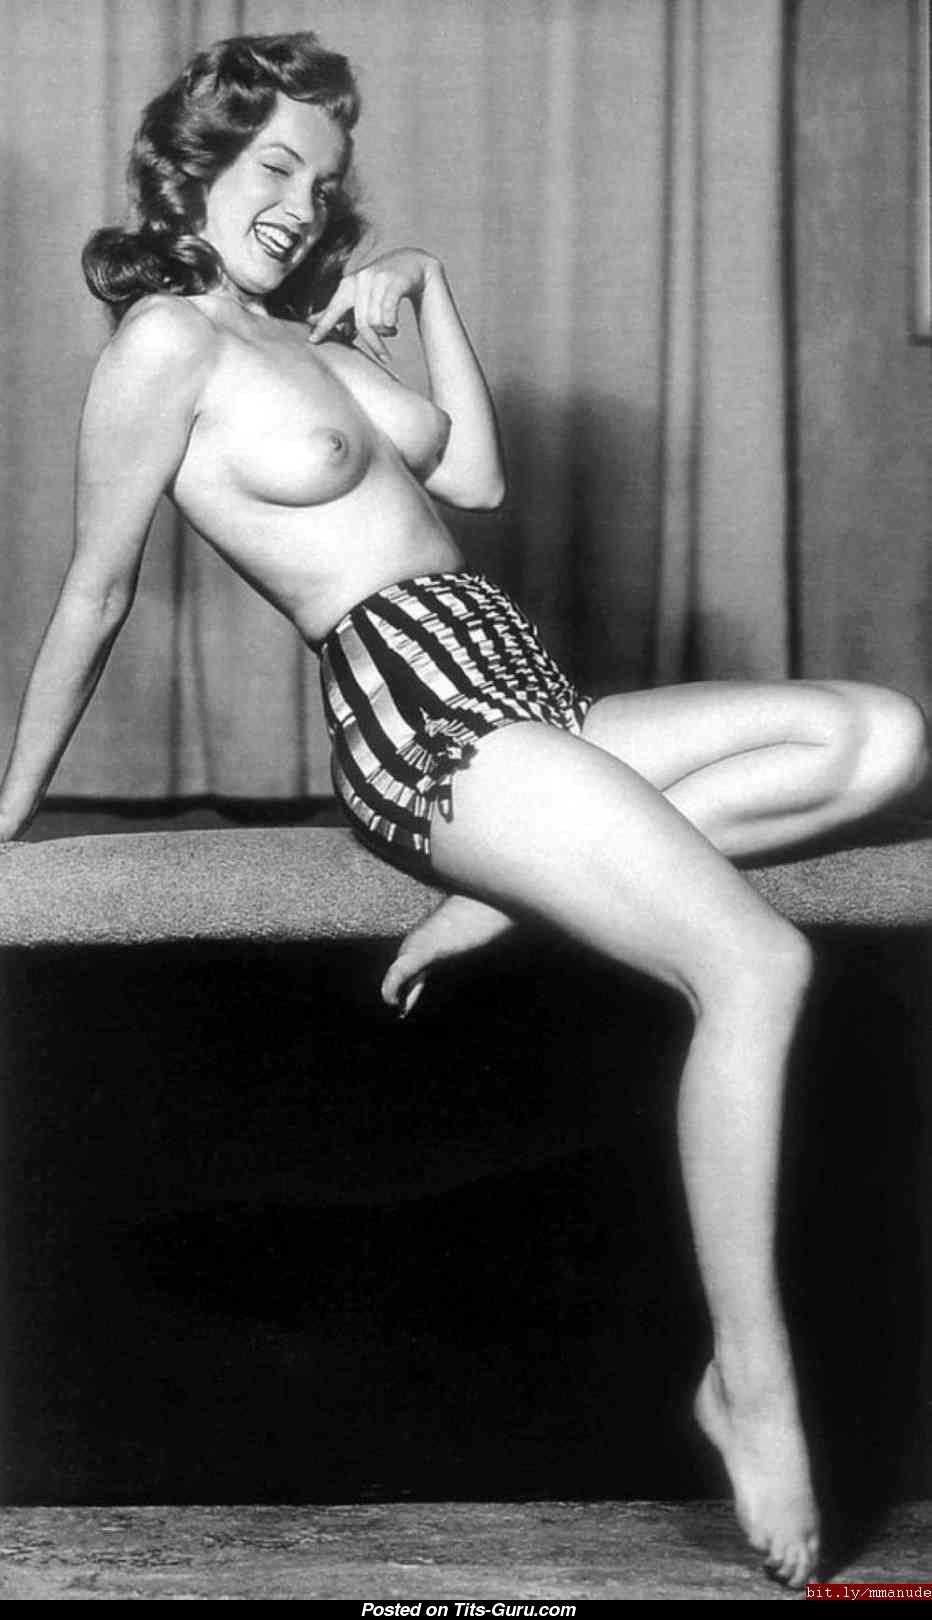 Marilyn monroe nude having sex